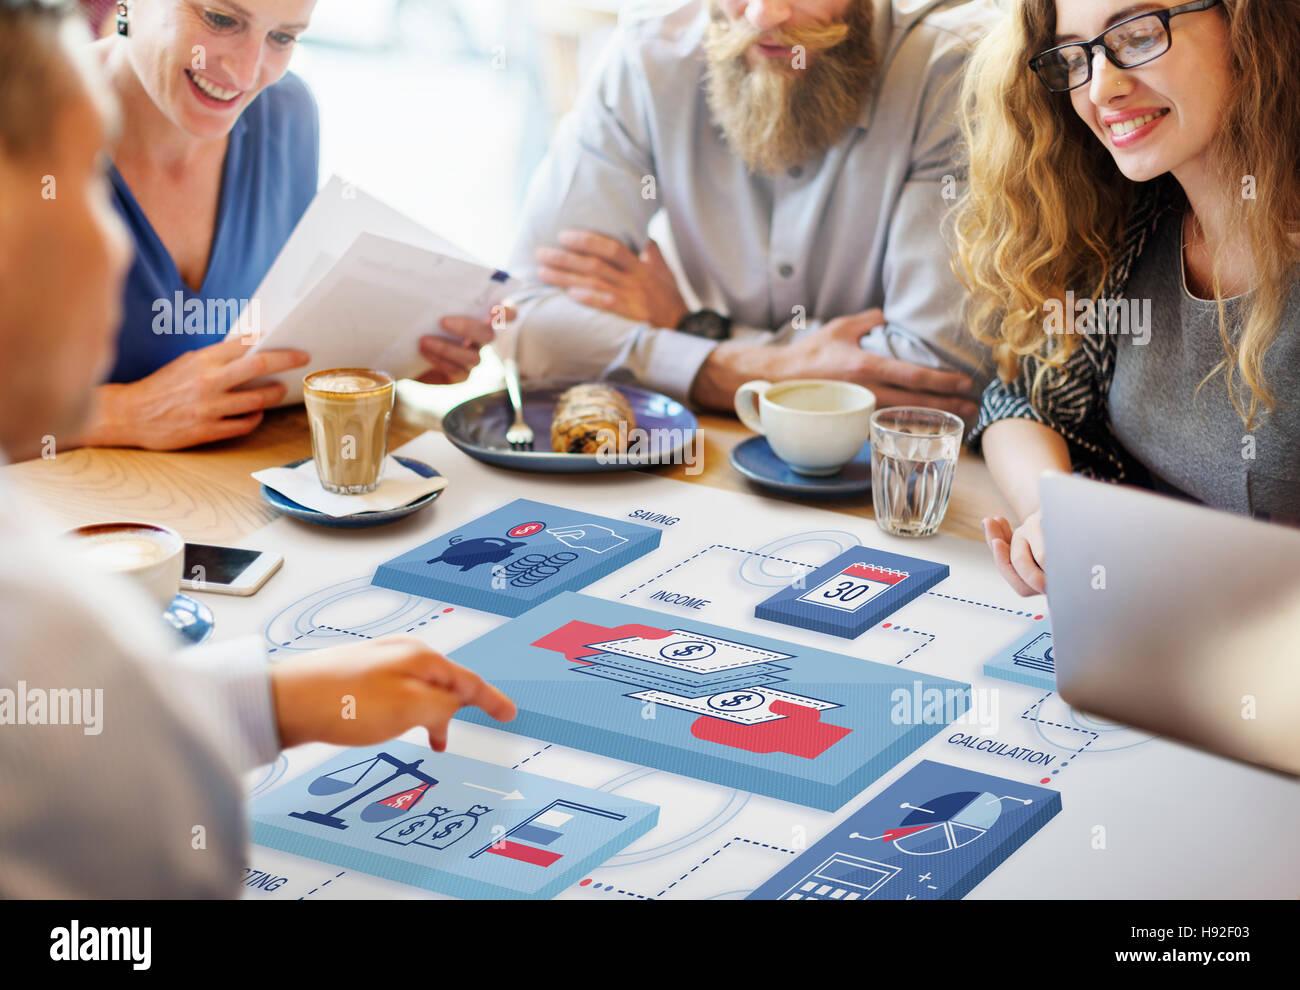 Commerce Corporate Invest Wealth Economy Concept - Stock Image